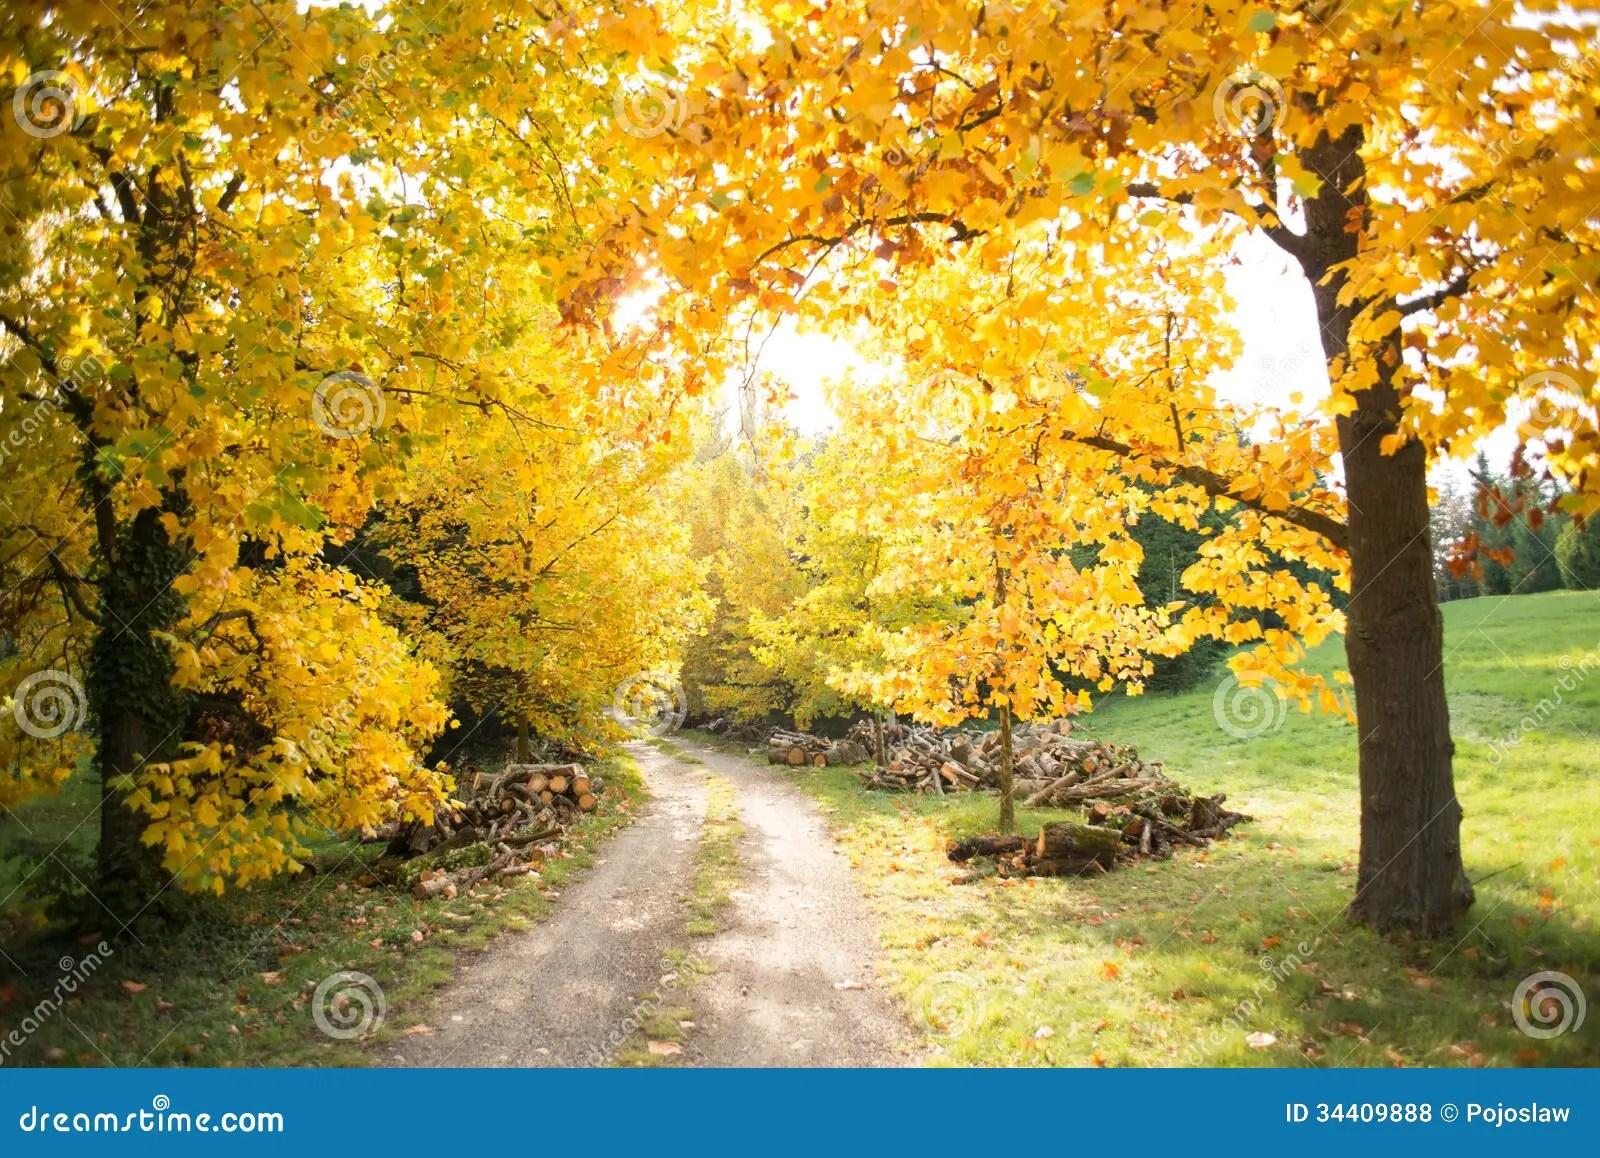 Free Desktop Wallpaper Fall Season Colorful Autumn Stock Photo Image Of Orange Season